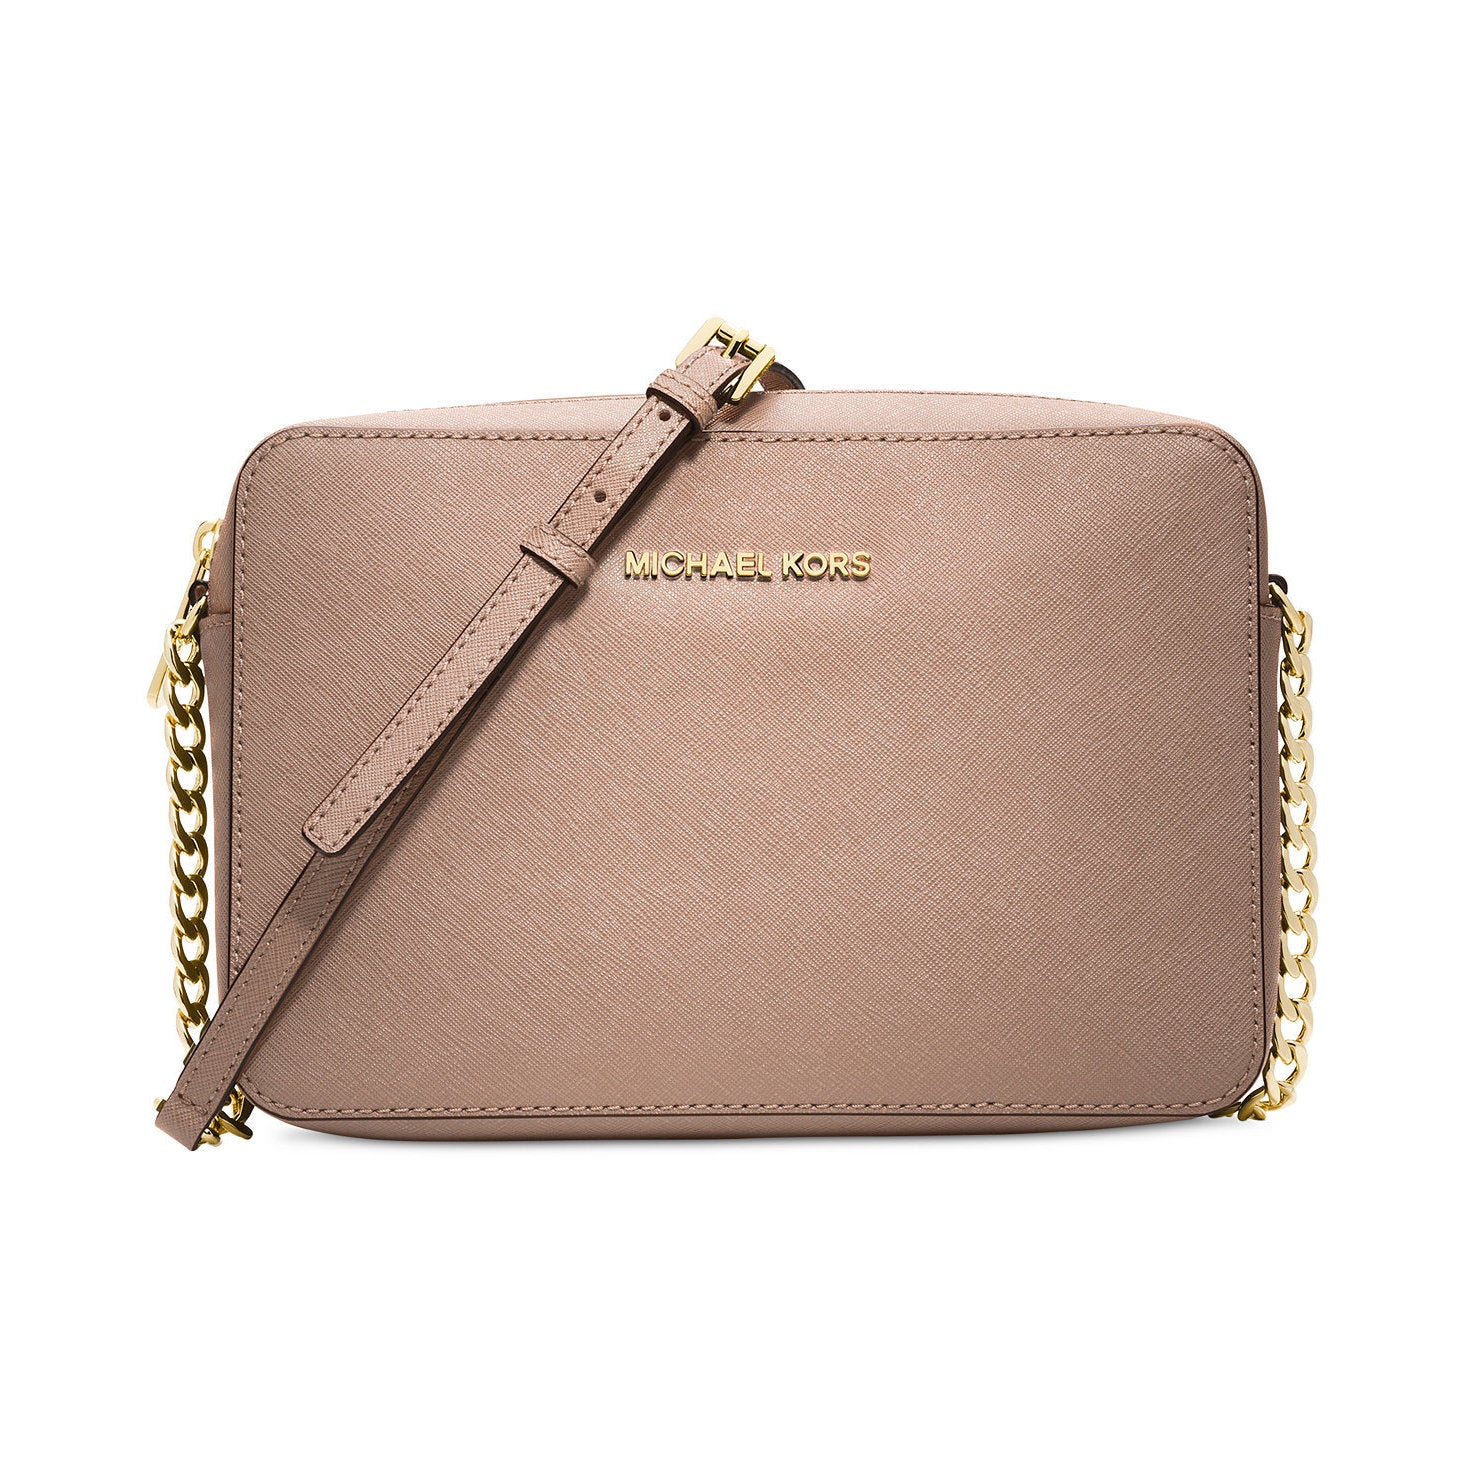 a5d7c260a341a Michael Kors Jet Set Saffiano Soft Pink Fawn Large Travel Crossbody Bag